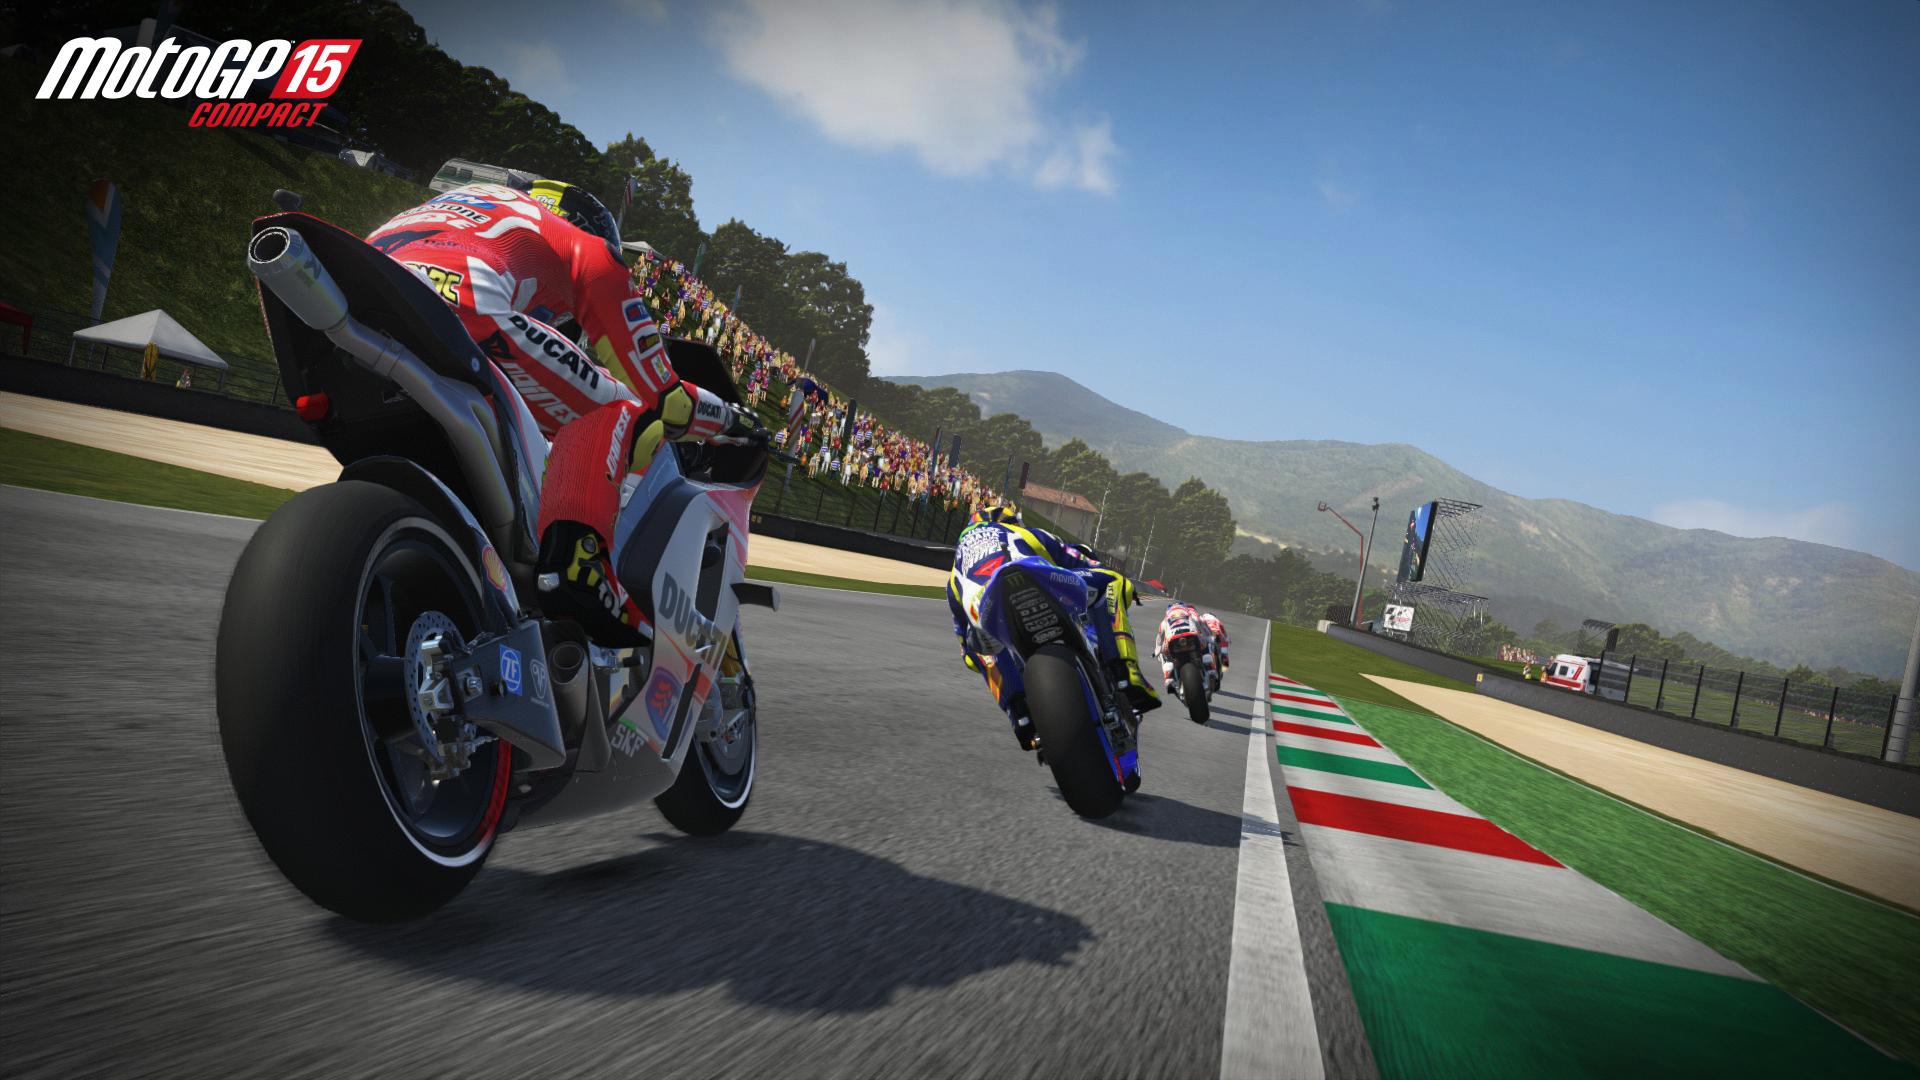 KHAiHOM.com - MotoGP™15 Compact